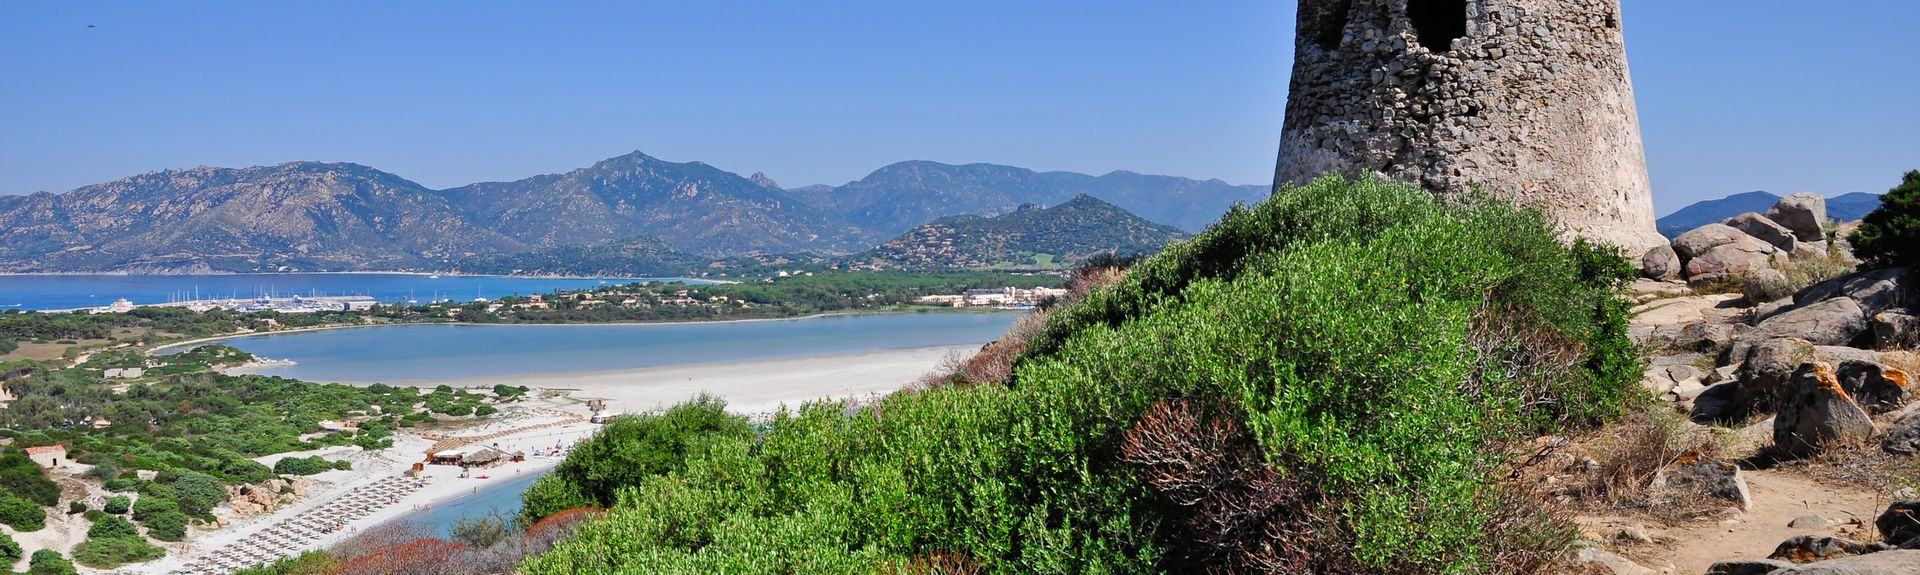 Villasimius, Sardinien, Italien